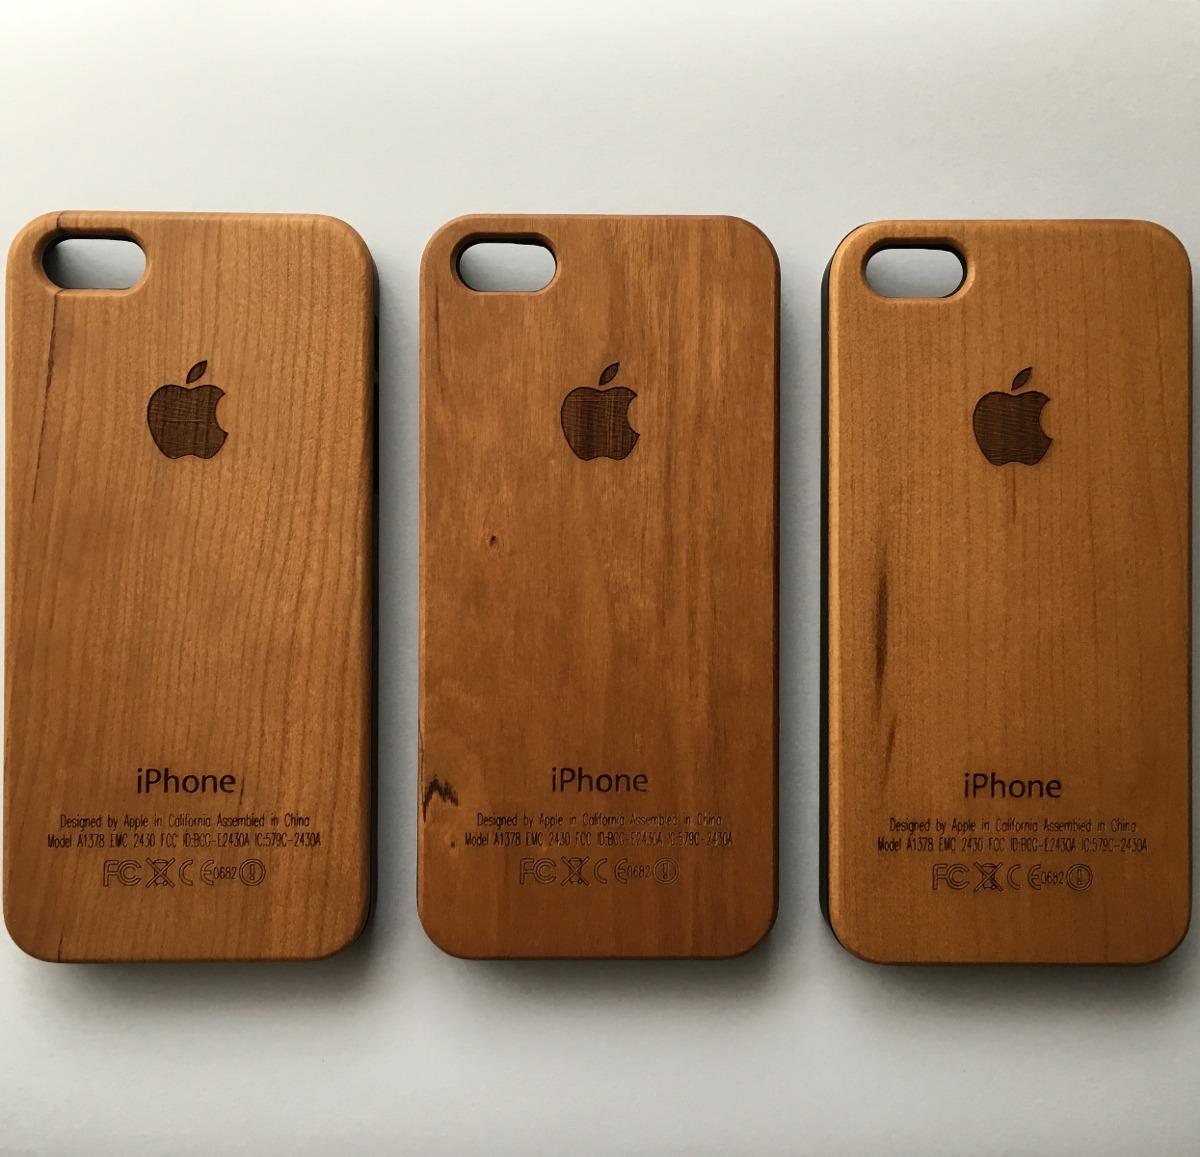 b9392ff65e9 Funda Carcasa Madera iPhone 5 Y 5s - $ 499,00 en Mercado Libre